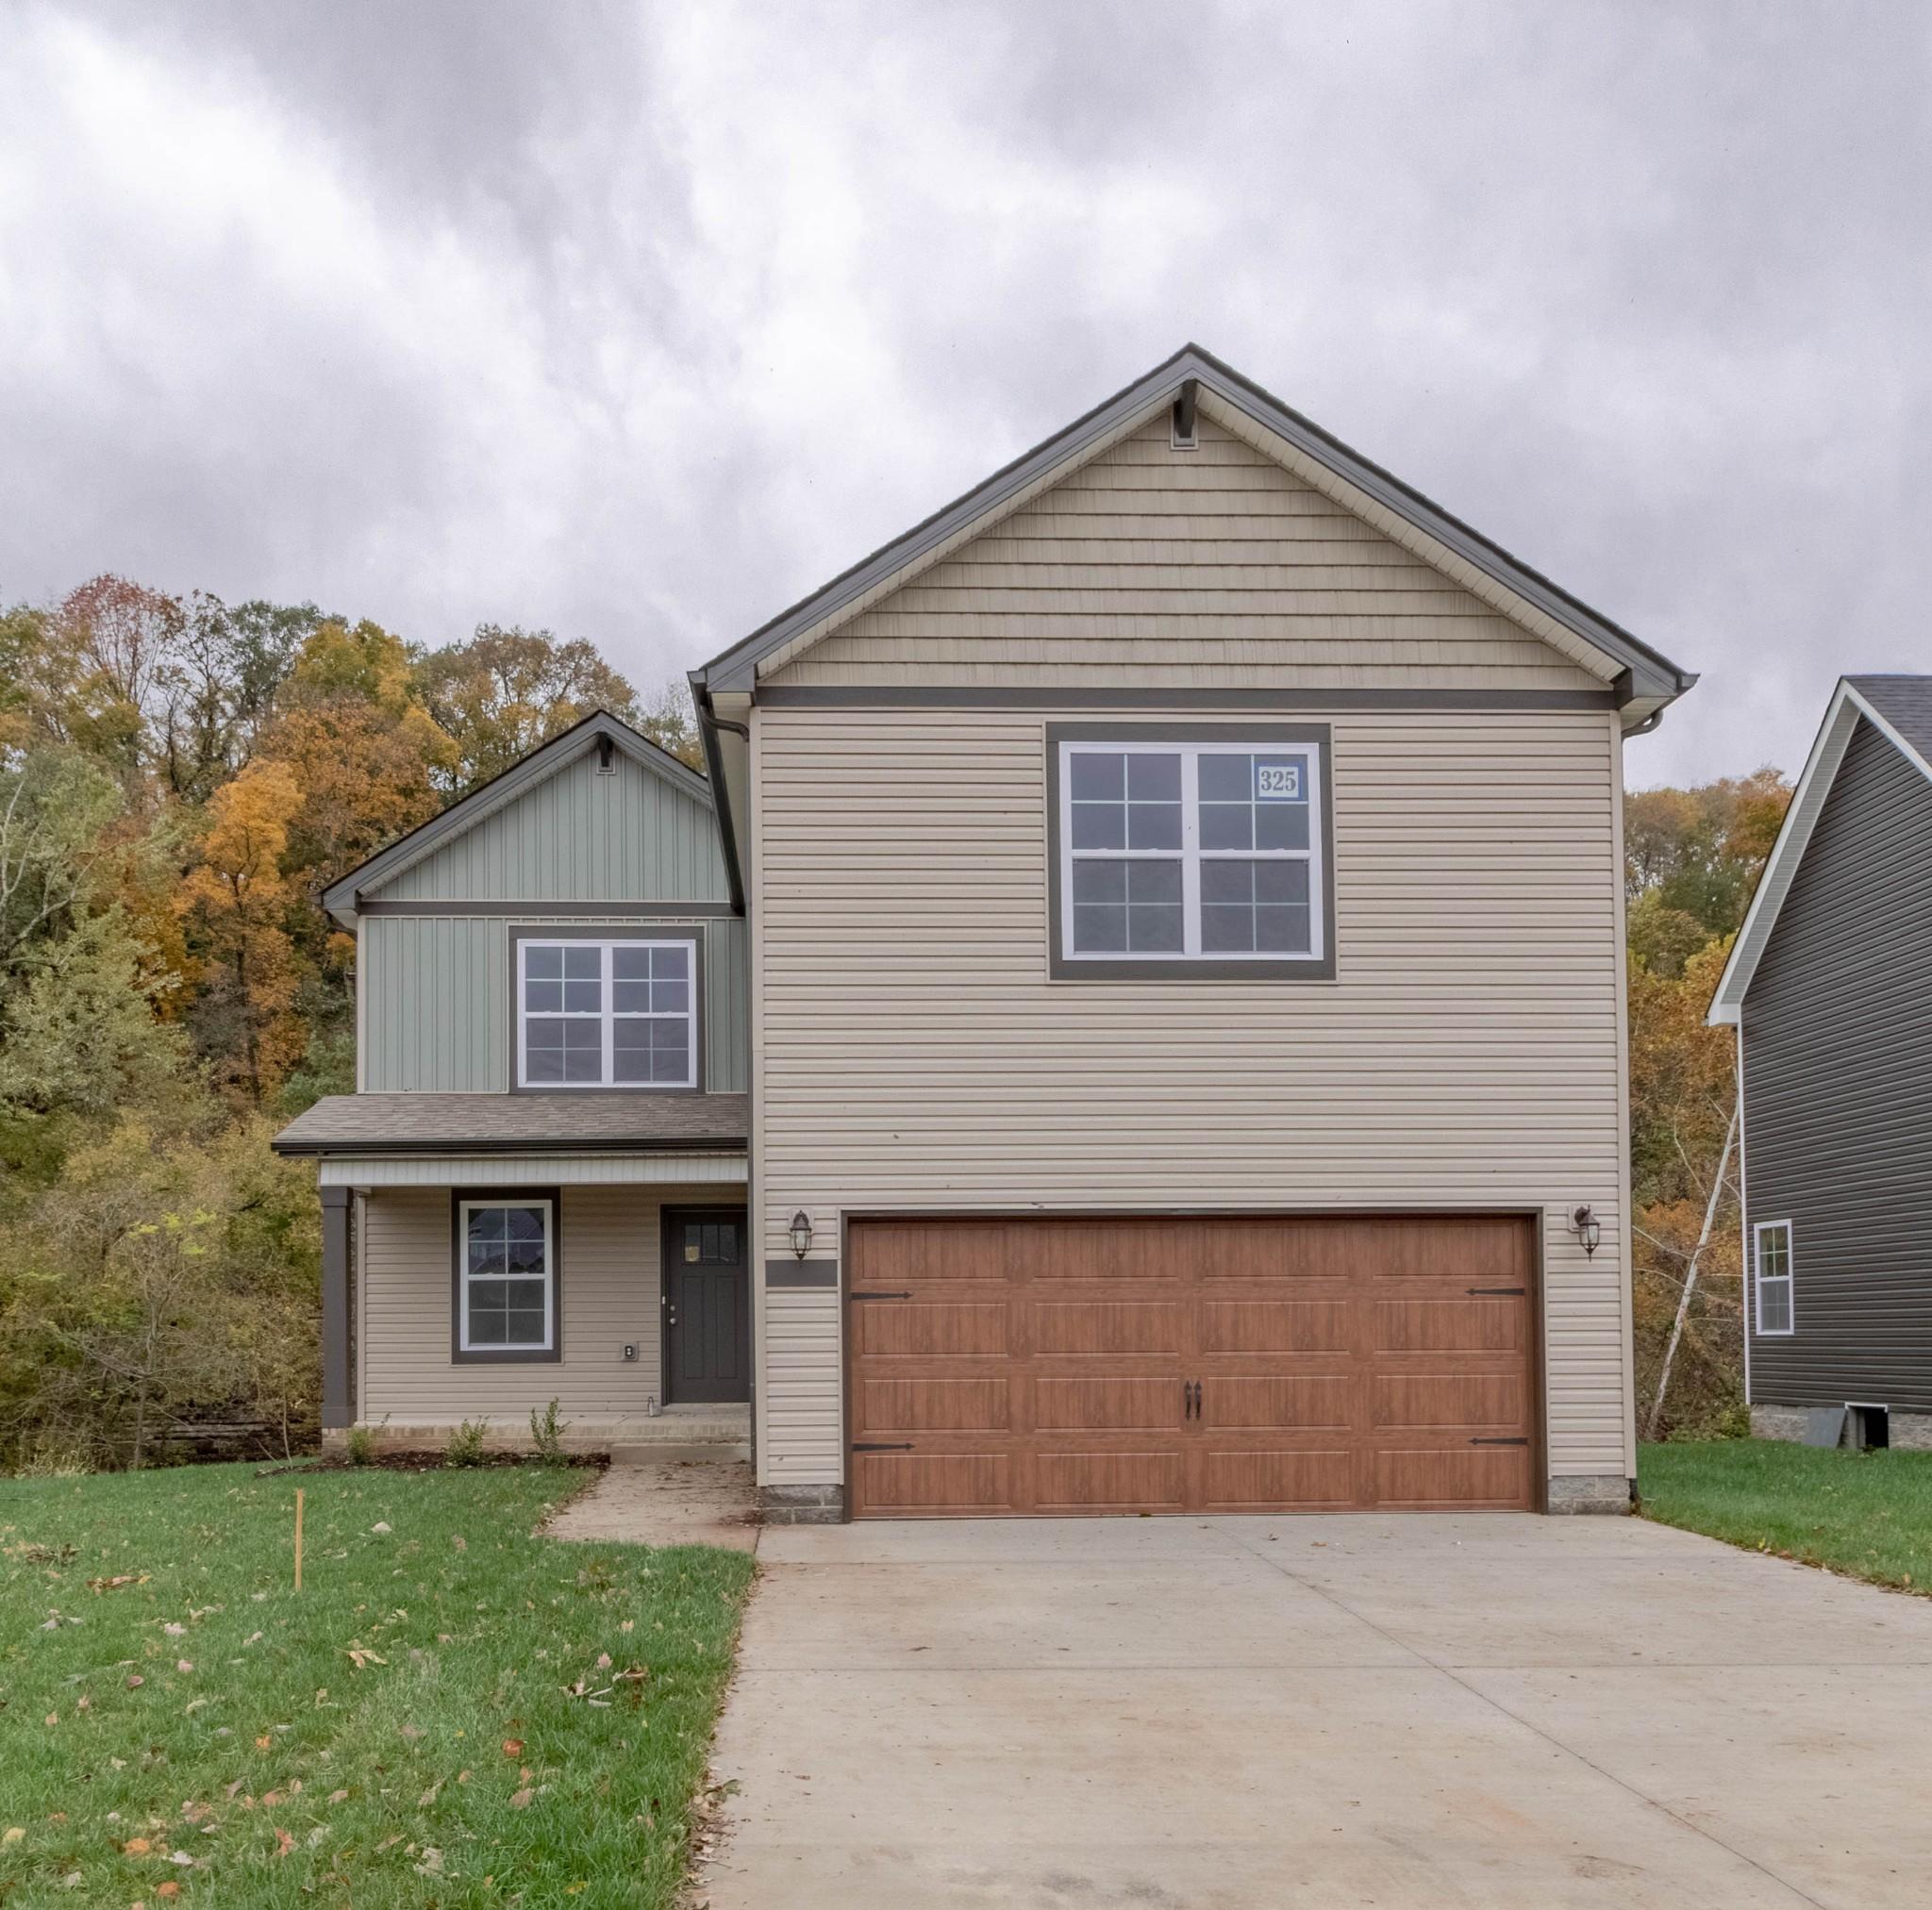 1717 Rains Rd, Clarksville, TN 37042 - Clarksville, TN real estate listing